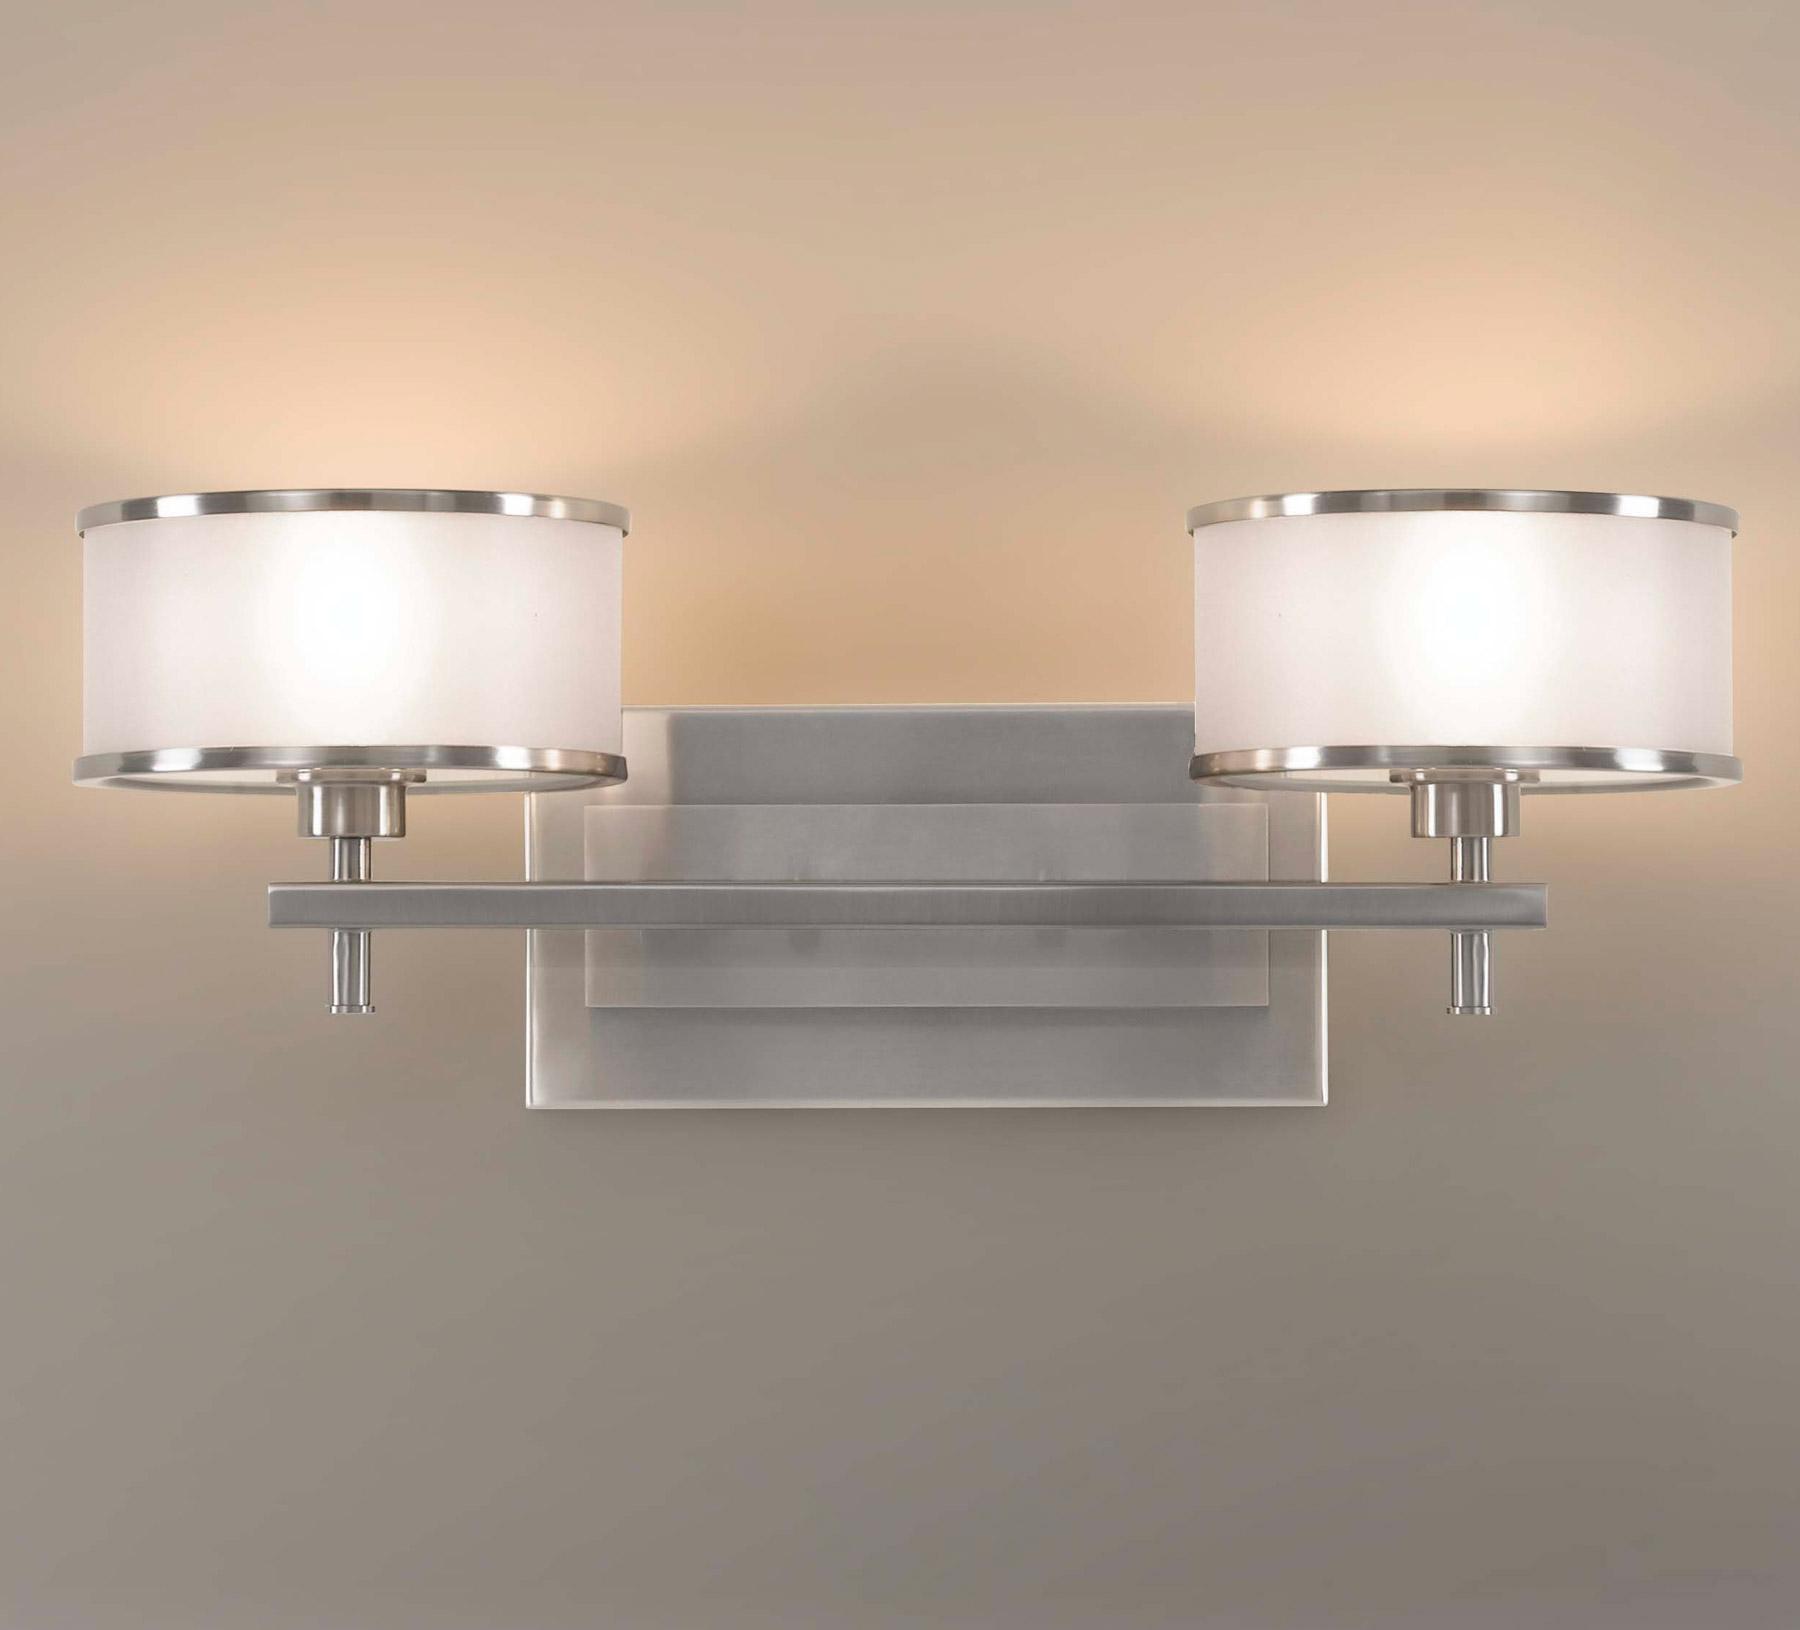 wall lighting bathroom vanity lights murray feiss vs13702 bs. Black Bedroom Furniture Sets. Home Design Ideas